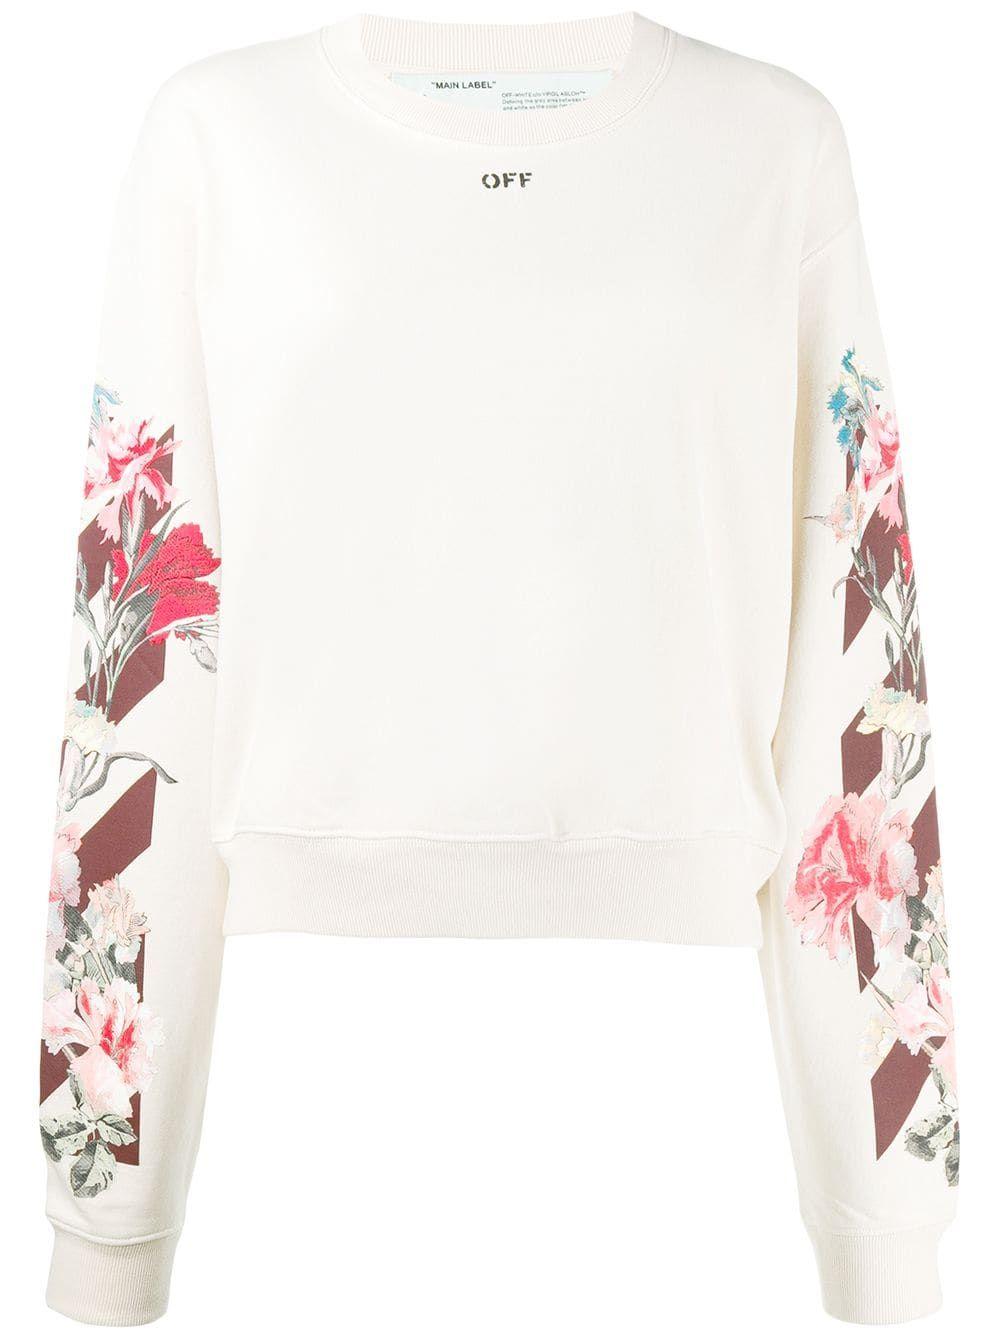 Off White Floral Sweatshirt Farfetch Floral Sweatshirts Clothes Design Detail Sweatshirt [ 1334 x 1000 Pixel ]